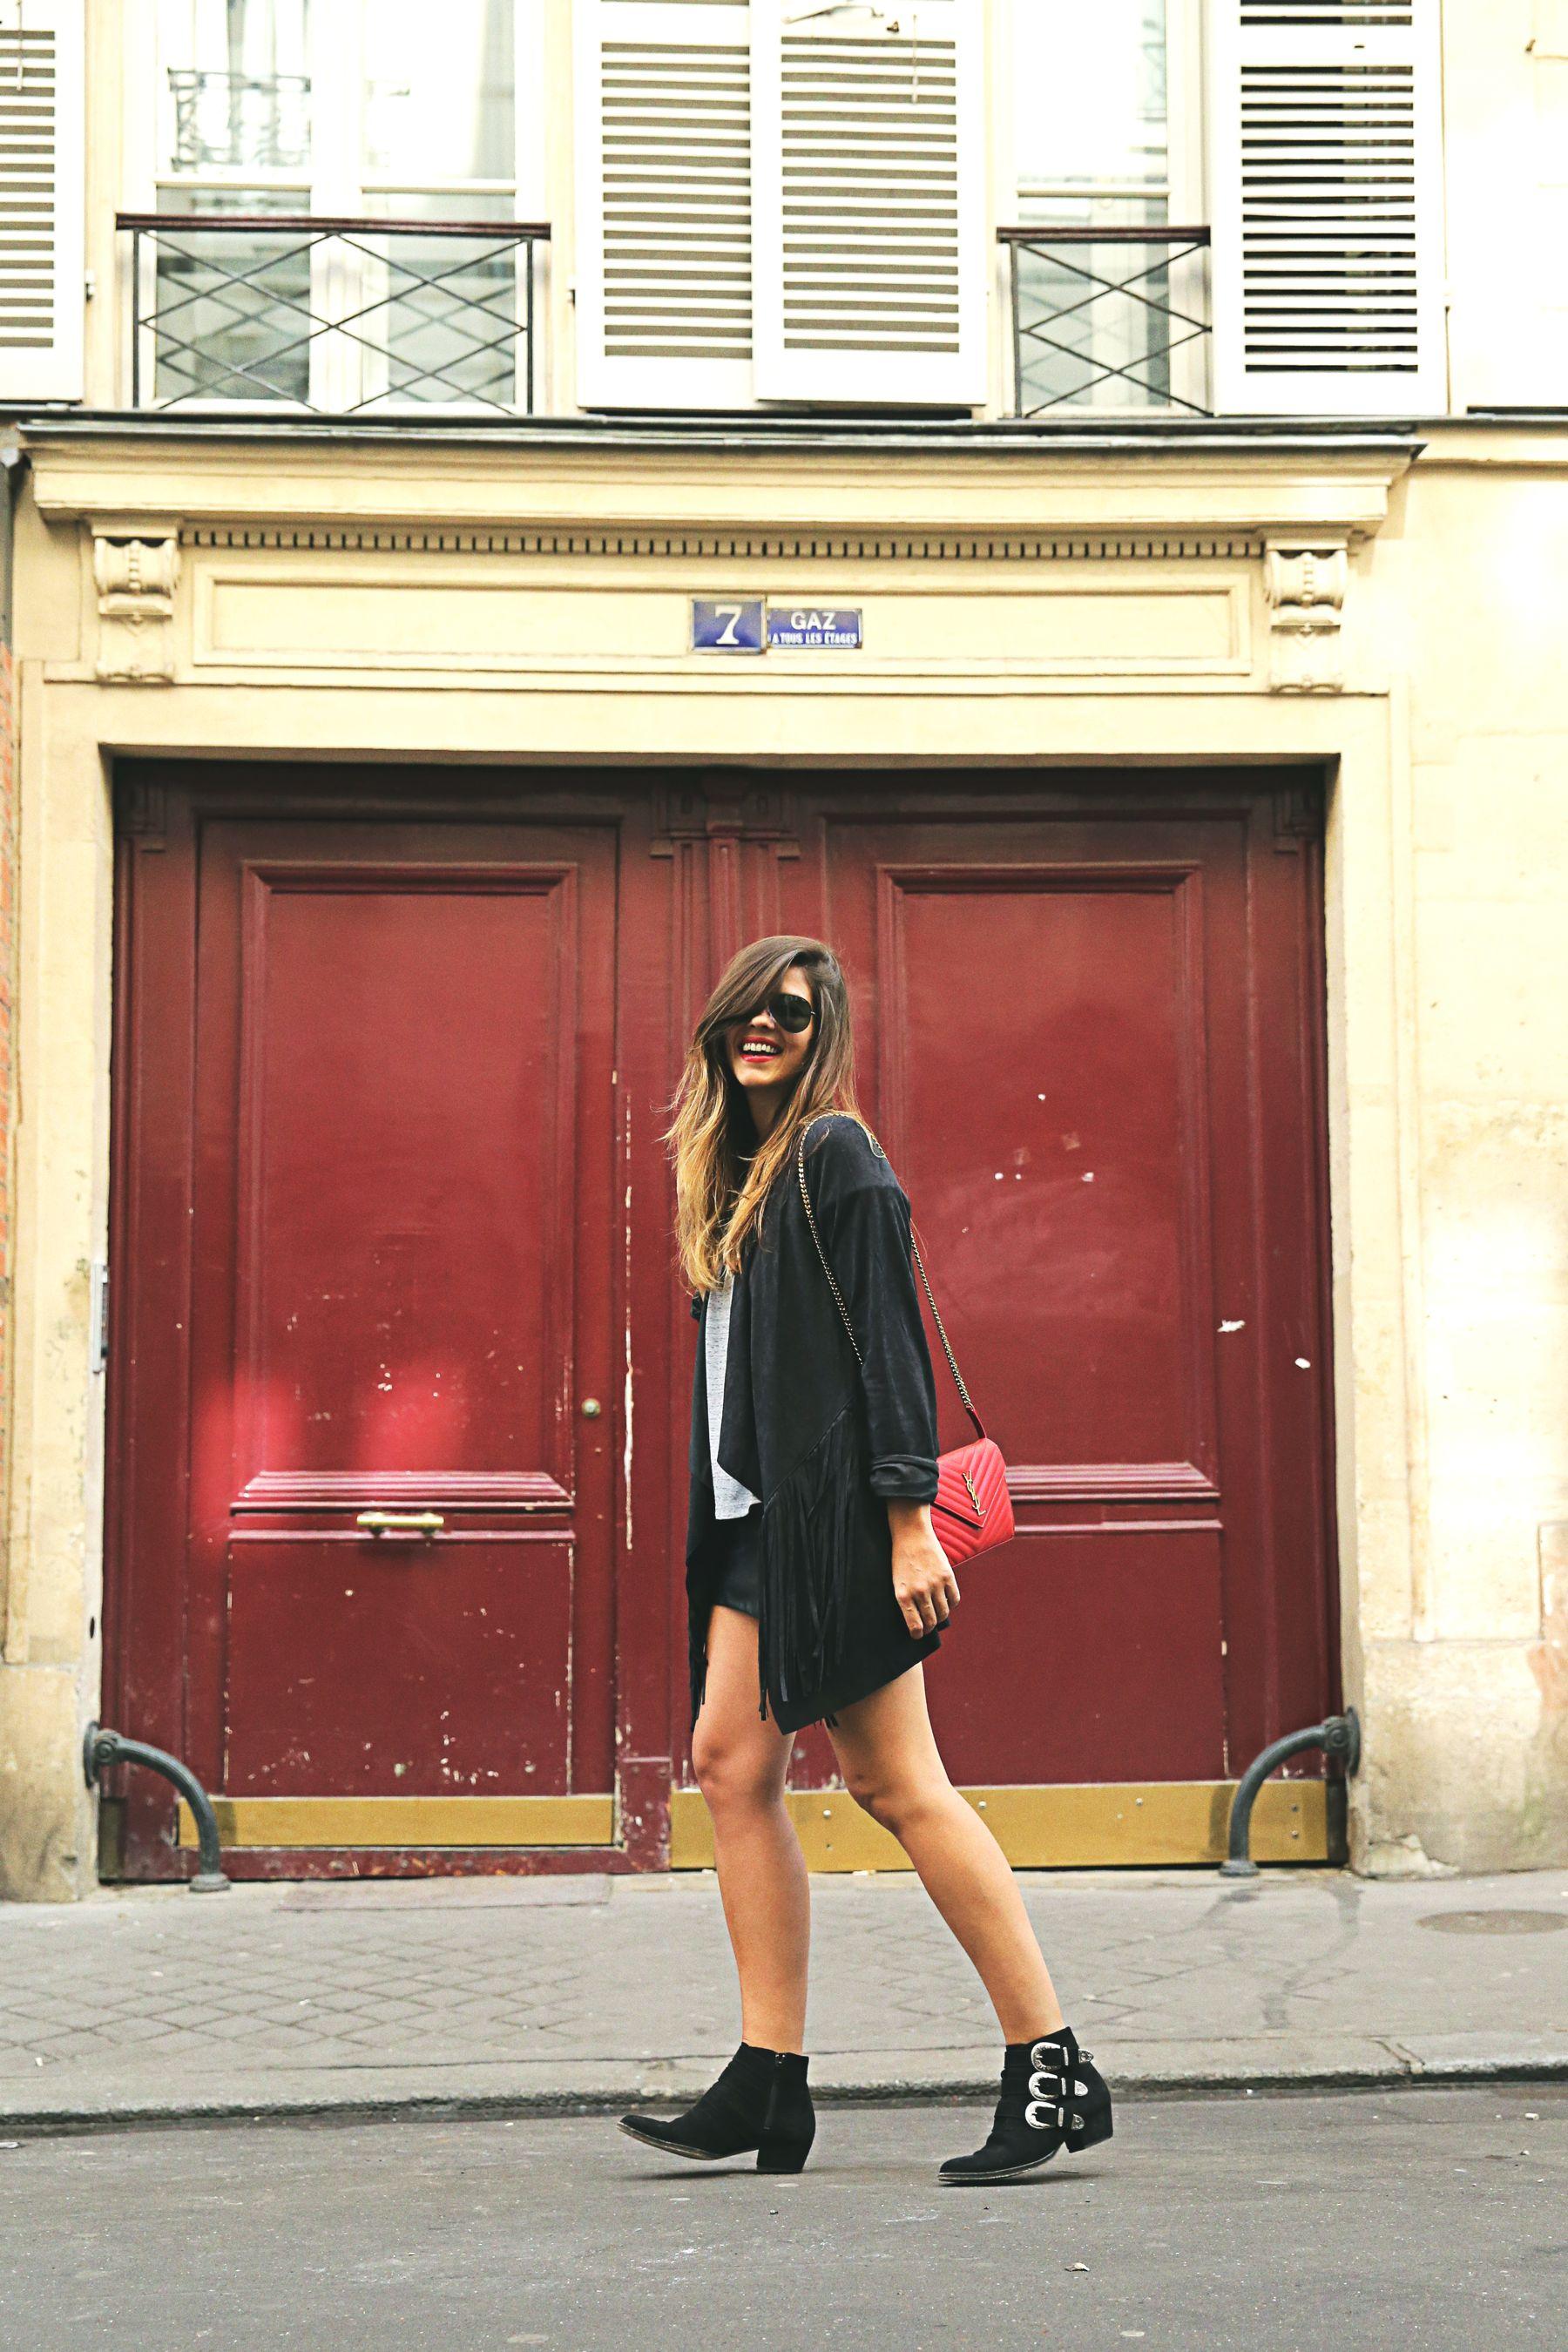 trendy-taste-look-outfit-street-style-ootd-blog-blogger-fashion-spain-moda-españa-fringed-jacket-mustt-ysl-falda-mekdes-leather-piel-1